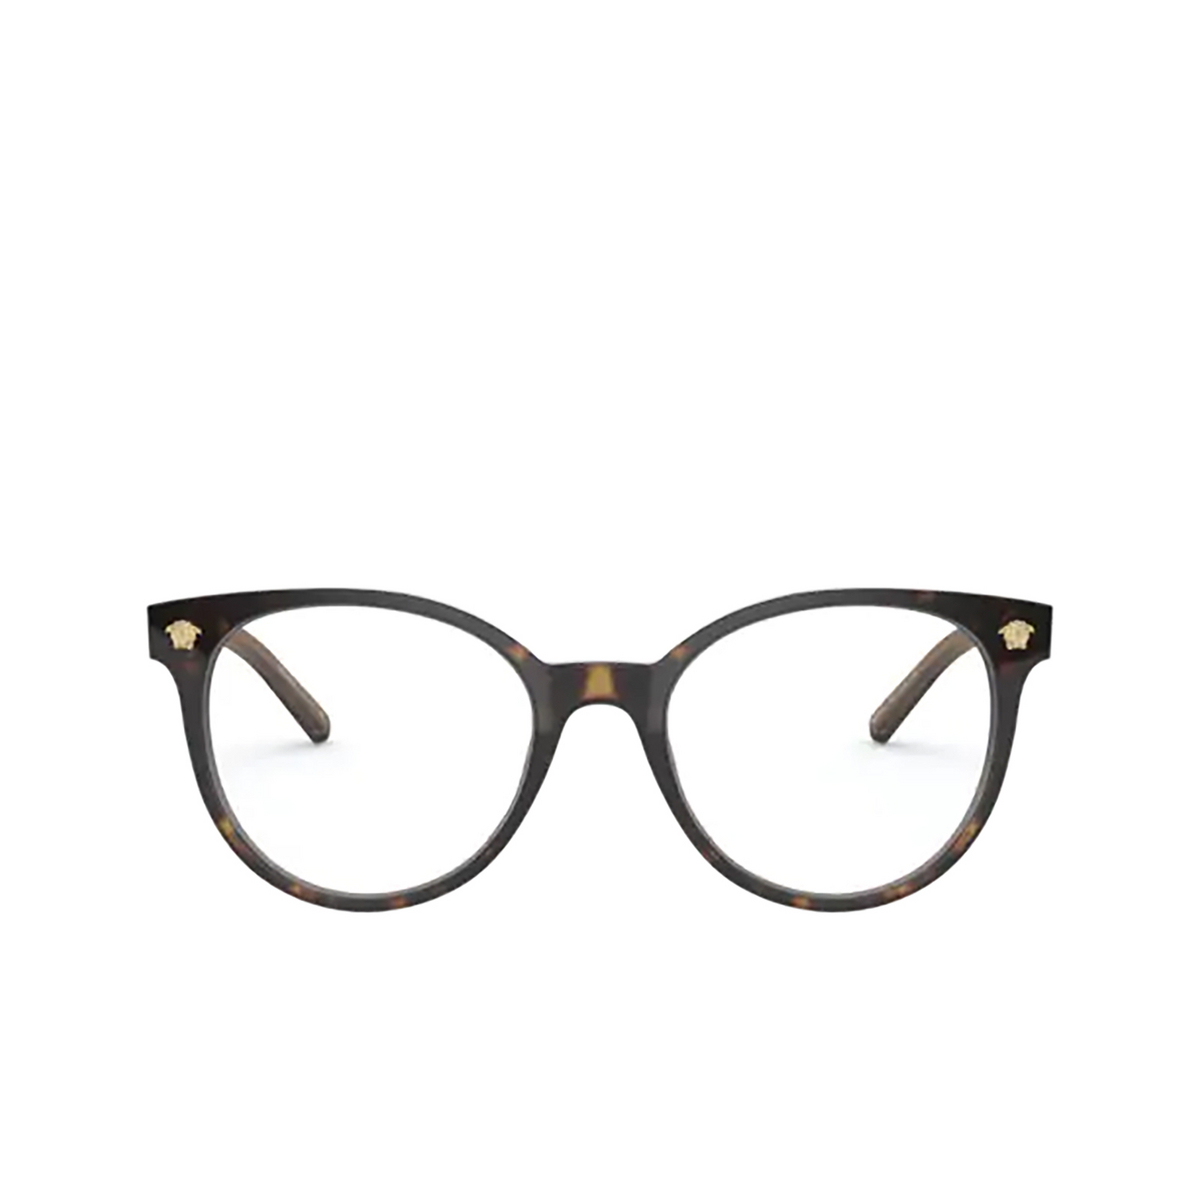 Versace® Round Eyeglasses: VE3291 color Havana 108.